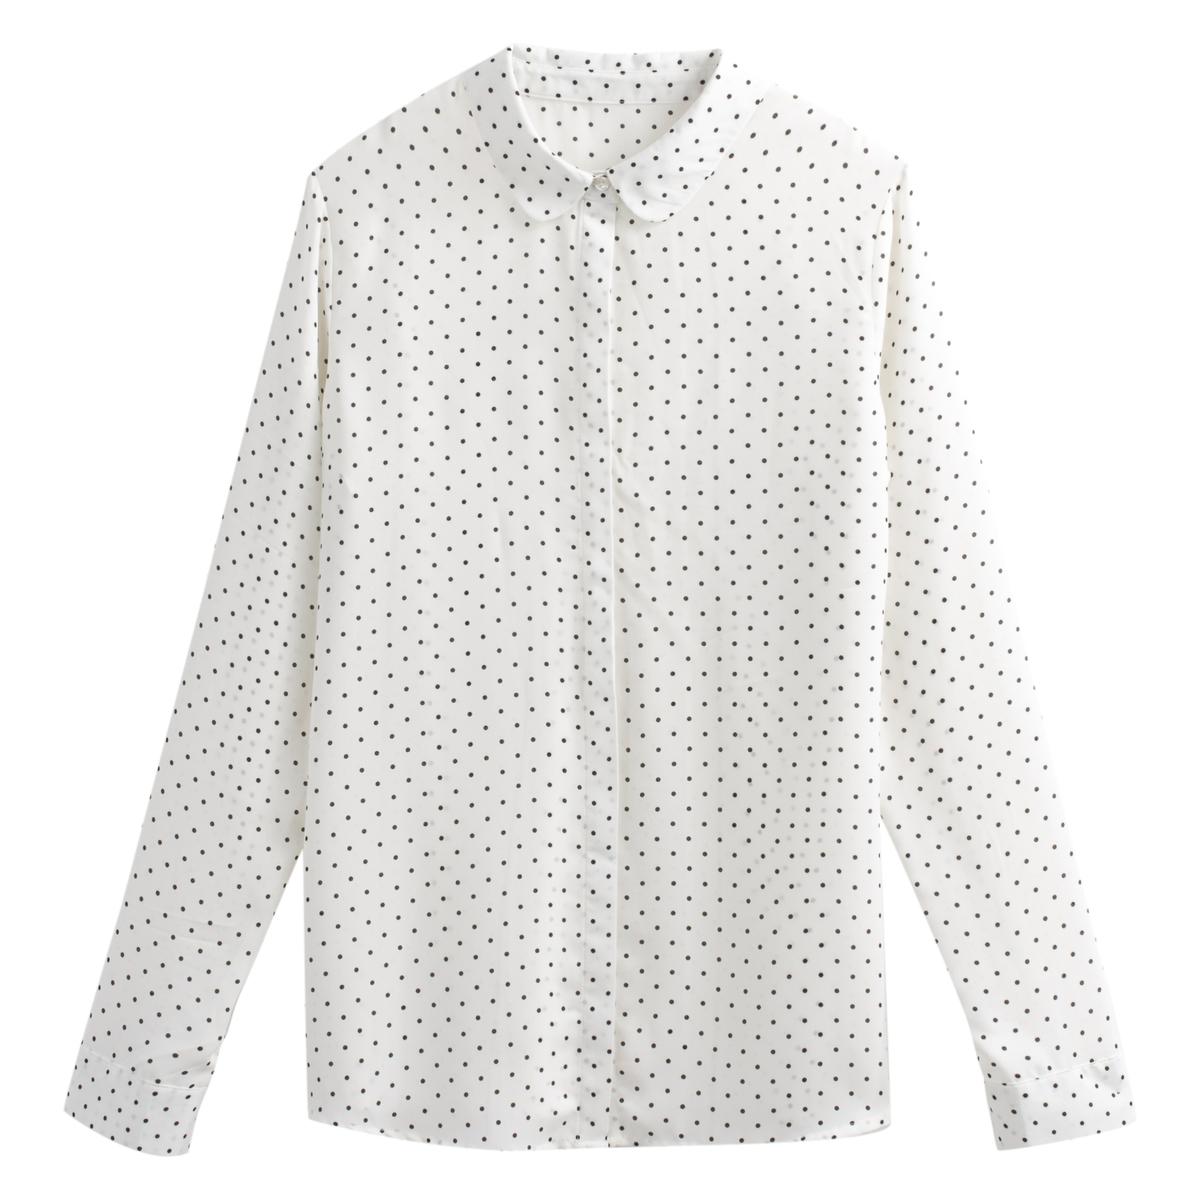 Camisa estampada de lunares, de manga larga